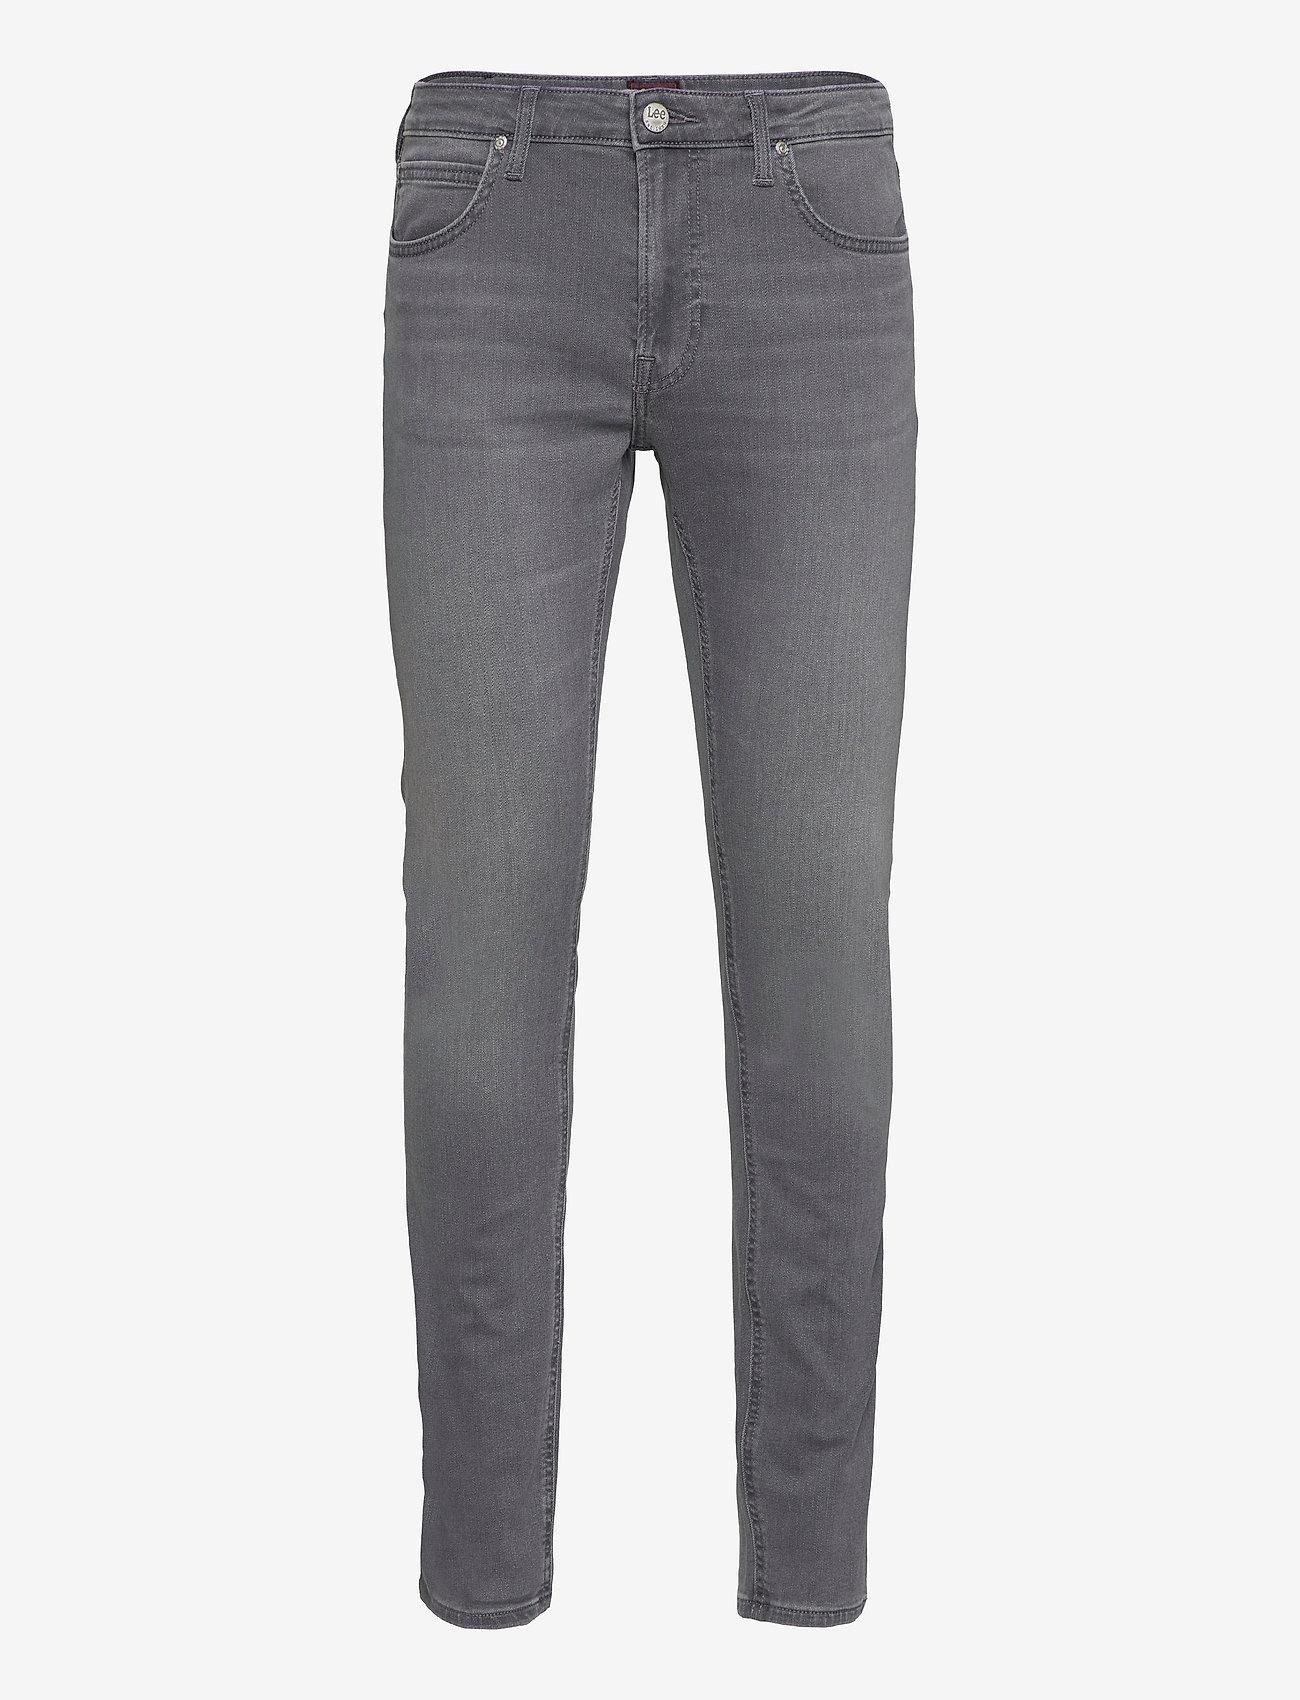 Lee Jeans - MALONE - skinny jeans - mid eden - 0